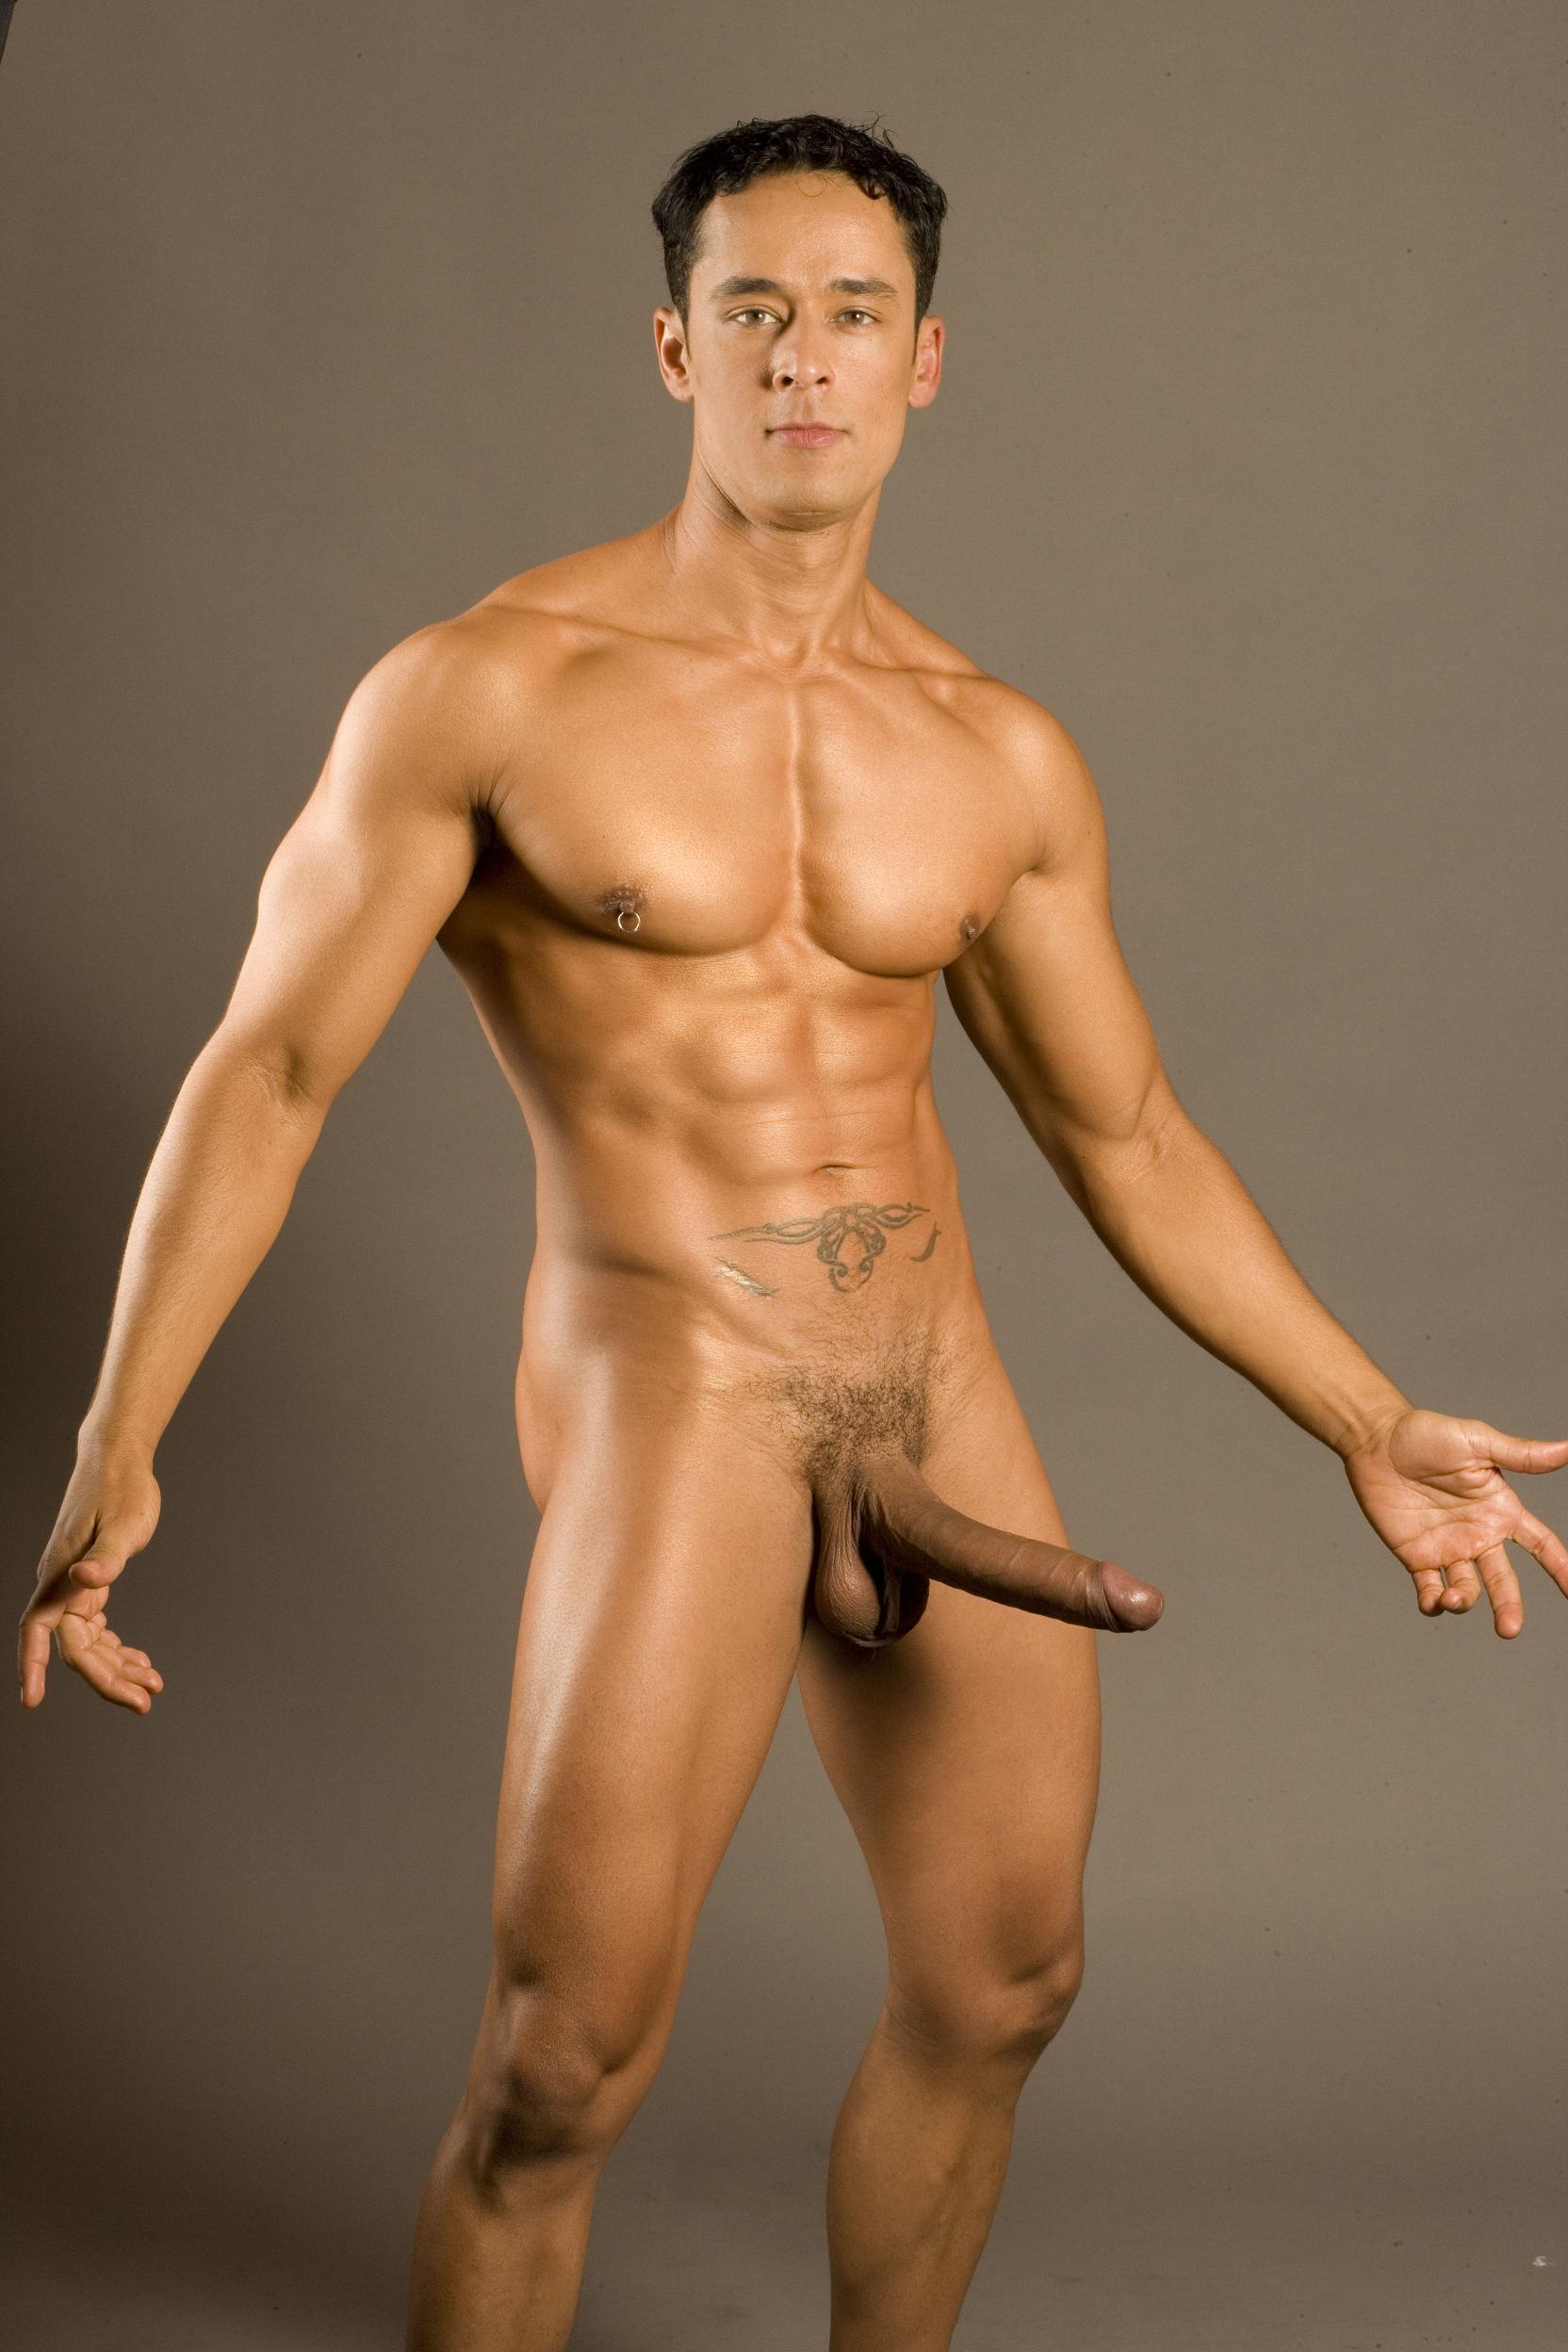 Actores Porno Hombres Desnudos porn hombres desnudos hombres desnudos porno gay adanih com